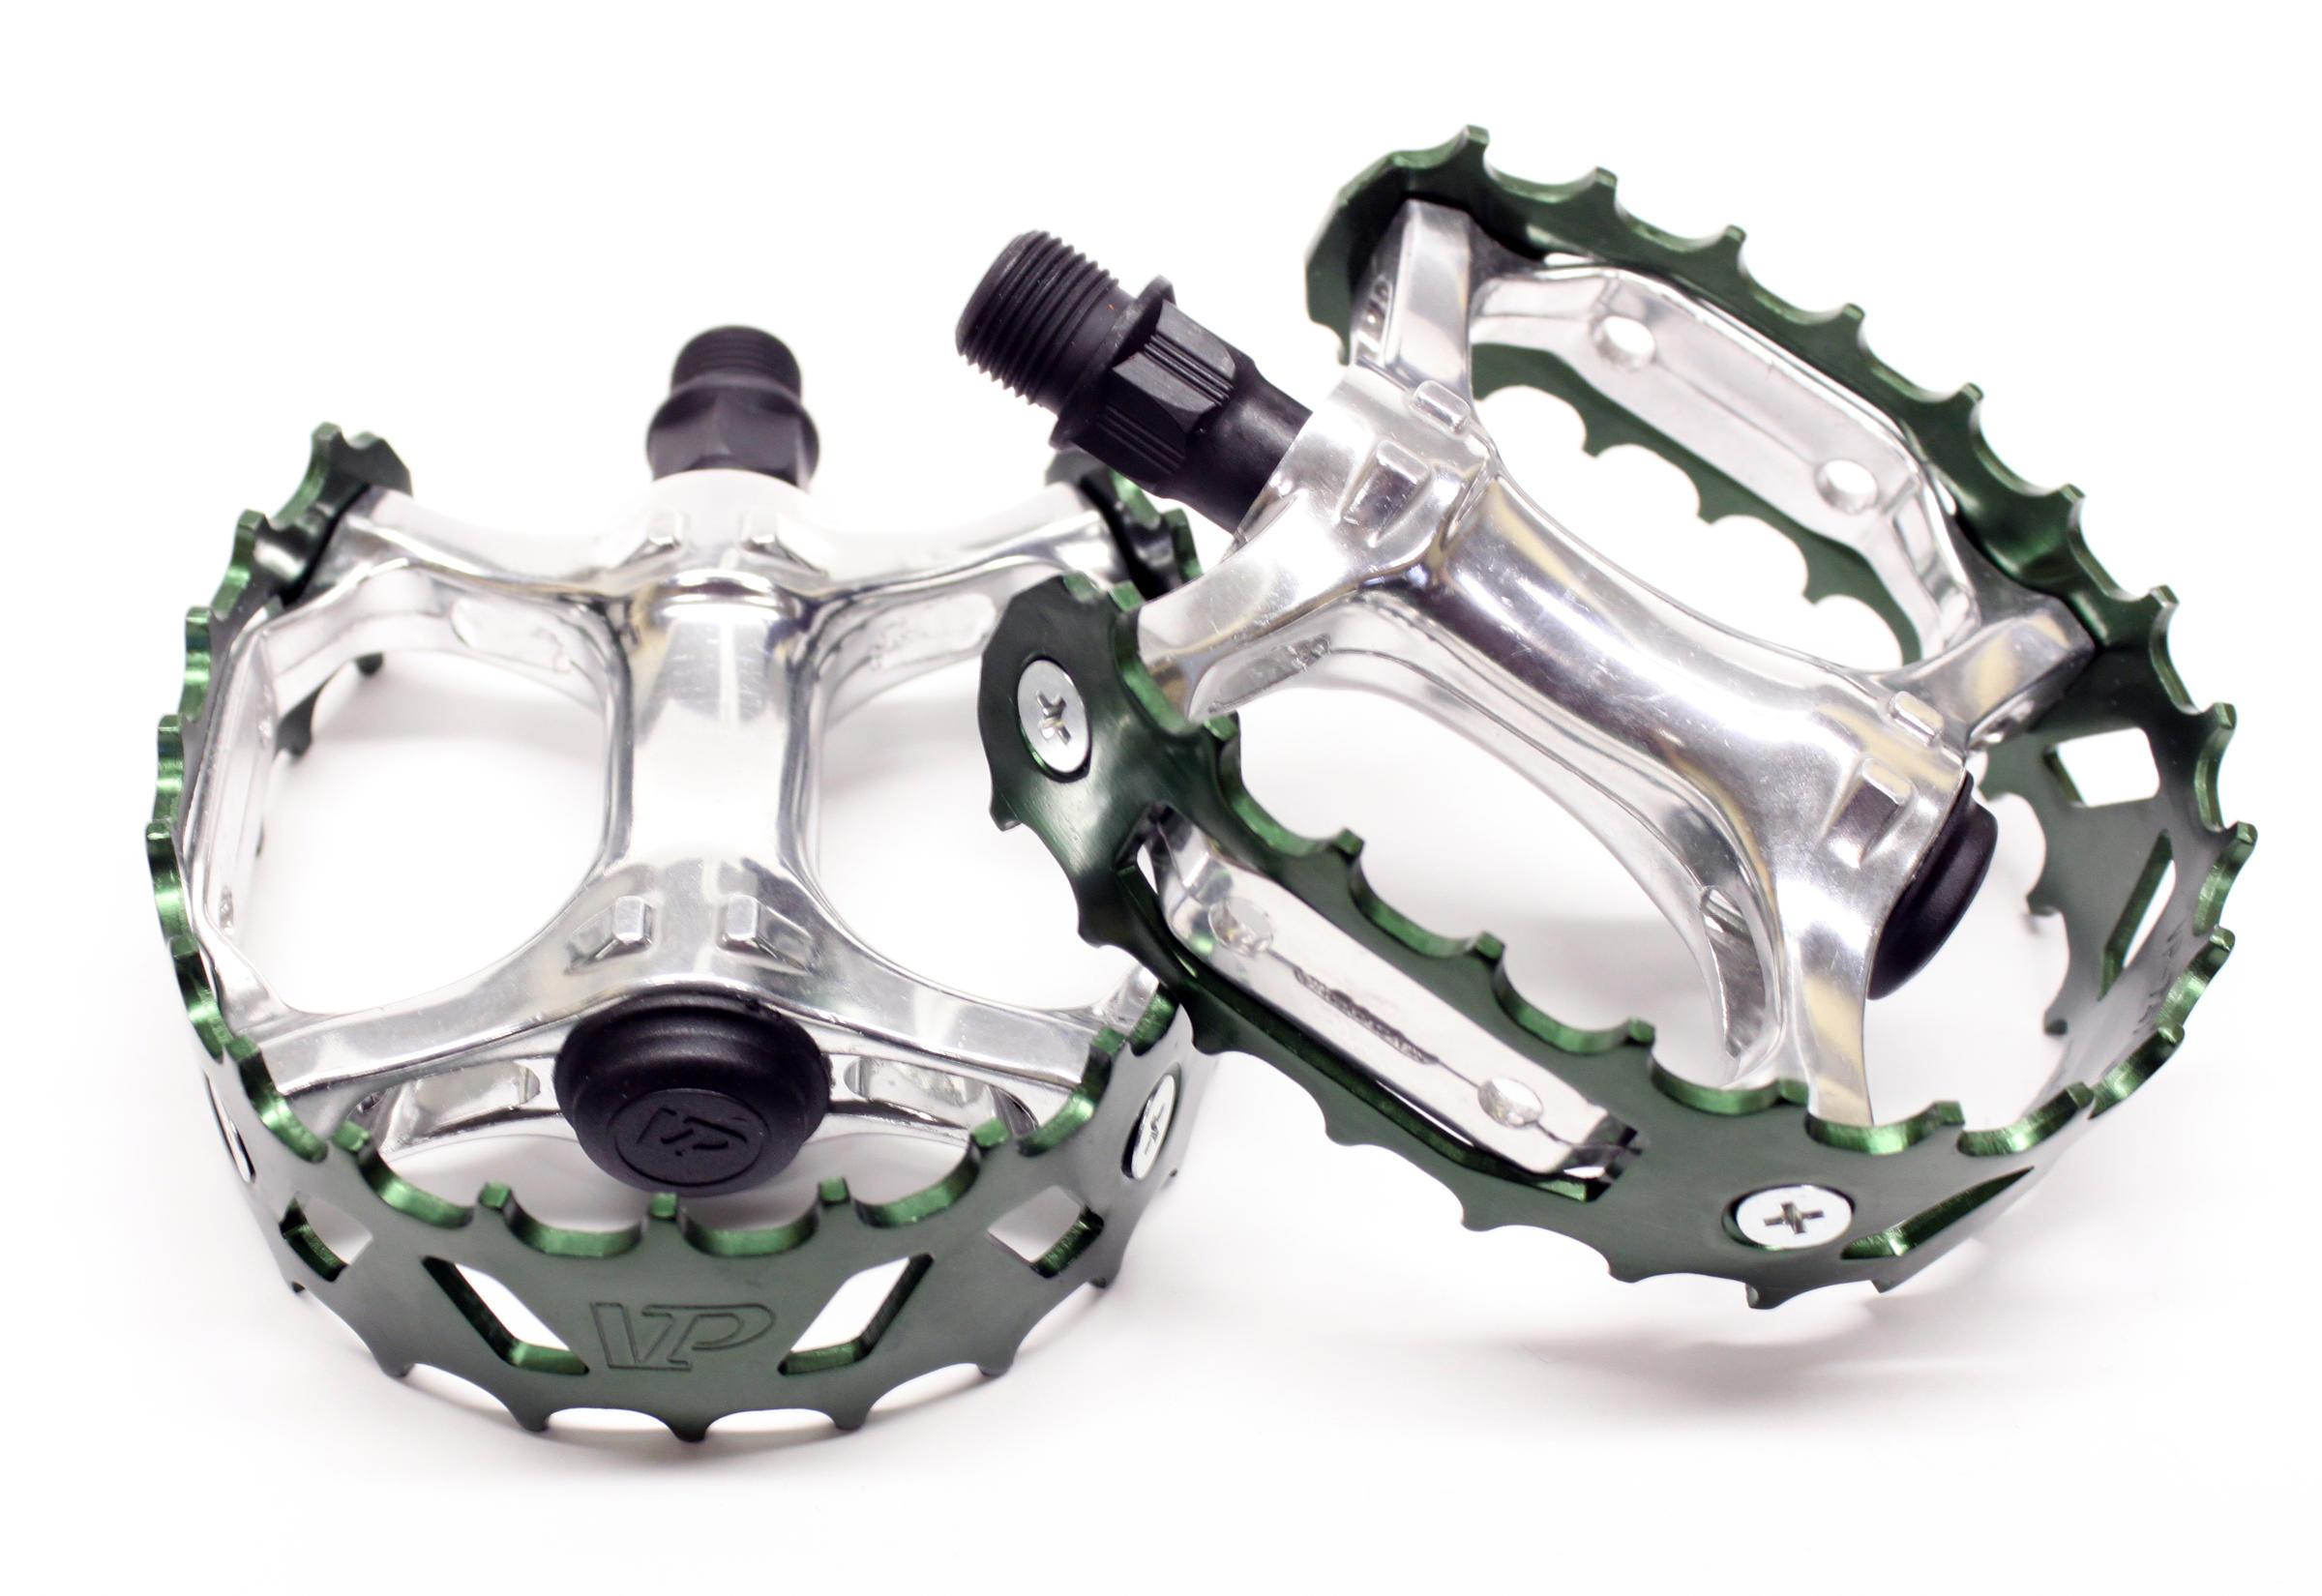 VP Components VP-747 Old School BMX Bike Bicycle Pedals